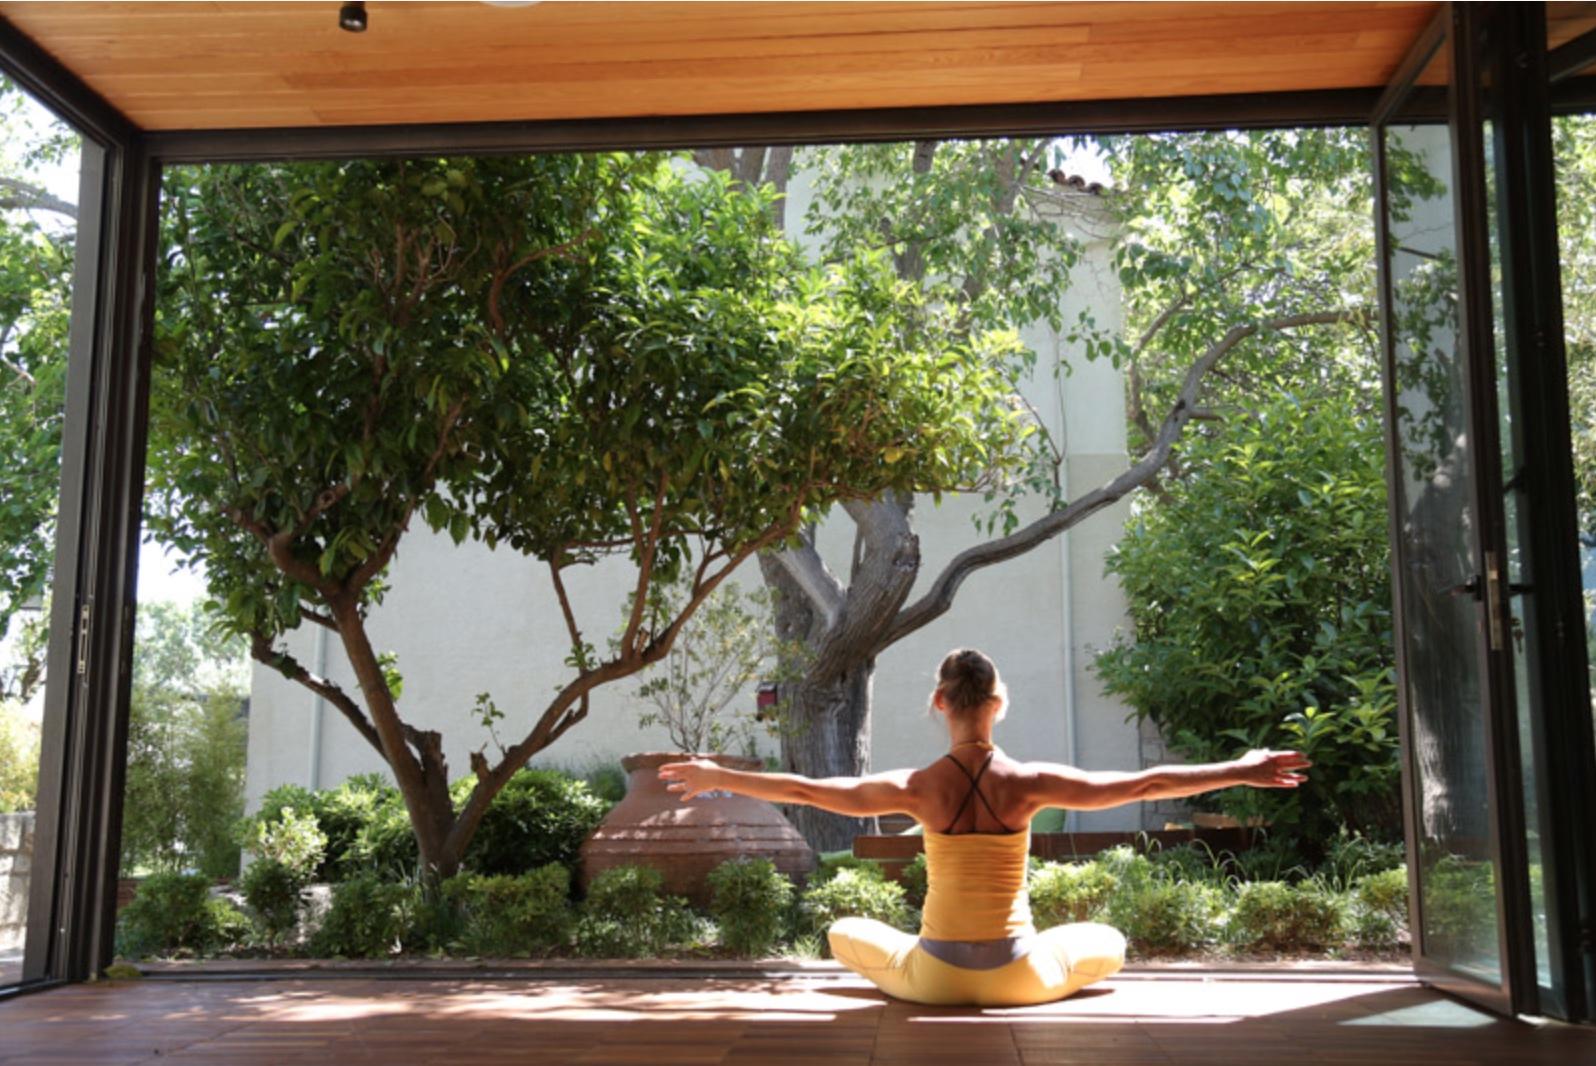 Pilates Retreat Asia Sri Lanka - Destination Deluxe